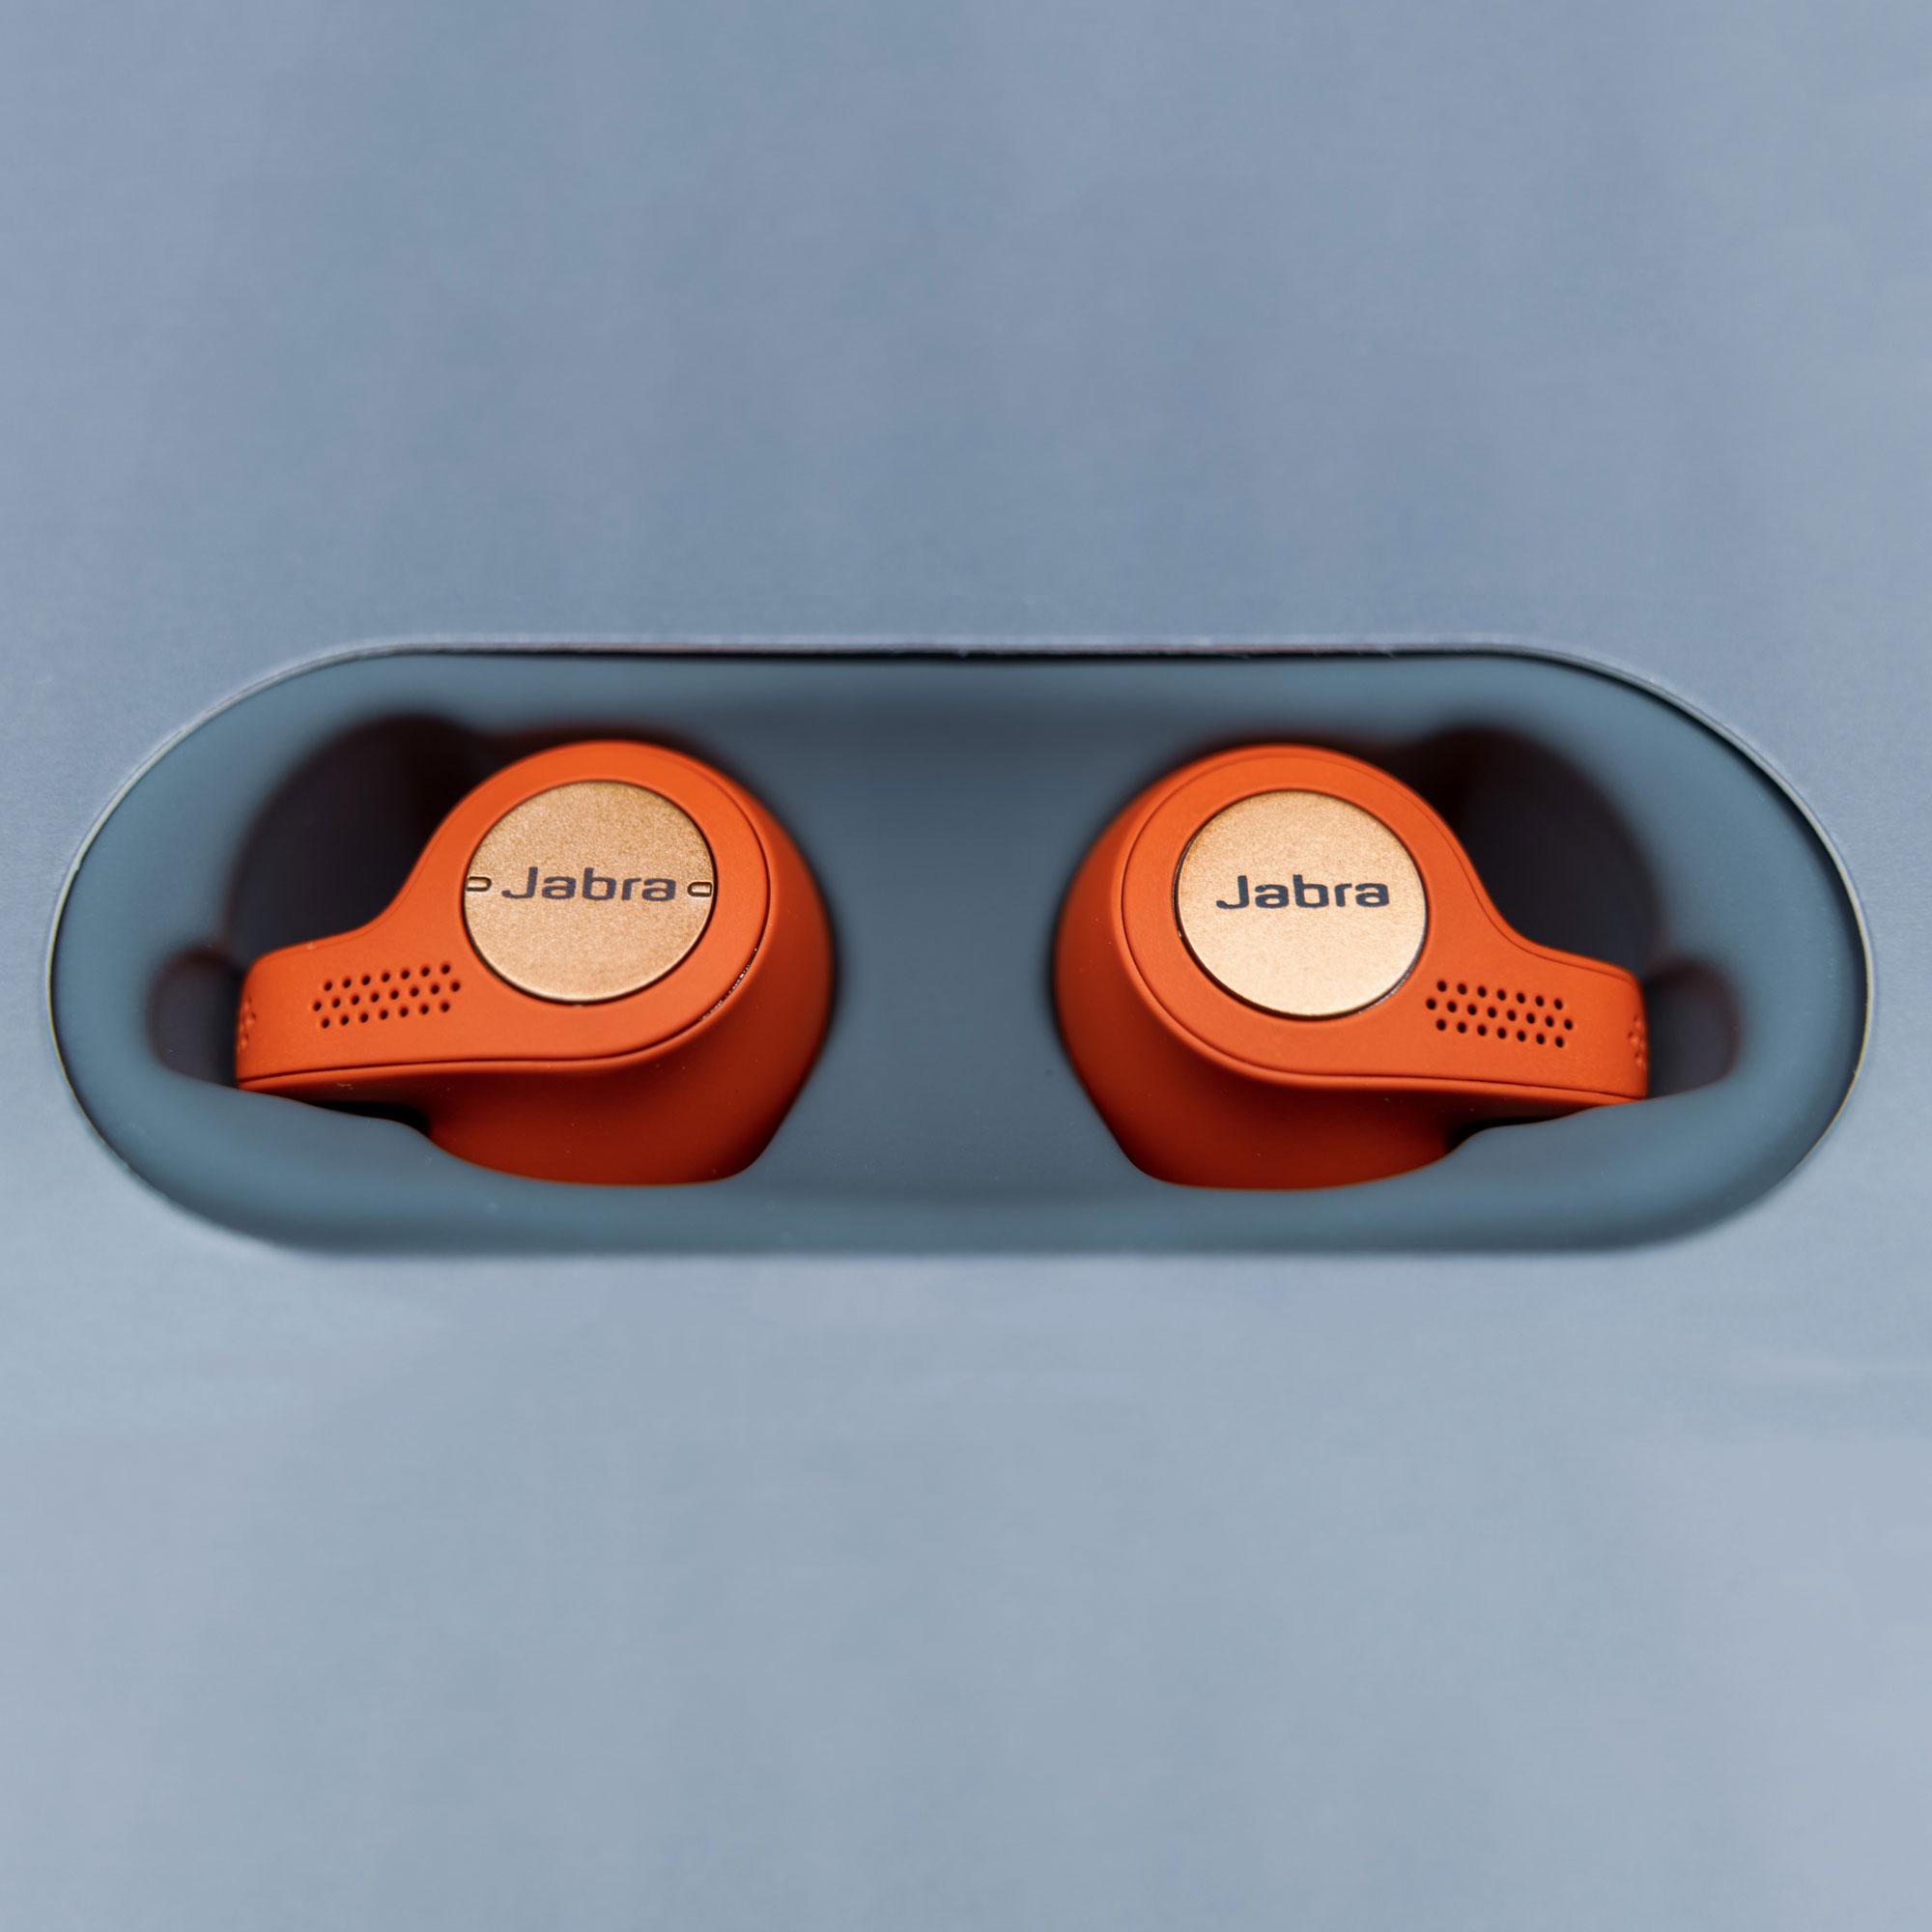 Jabra Elite Active 65t - le packaging